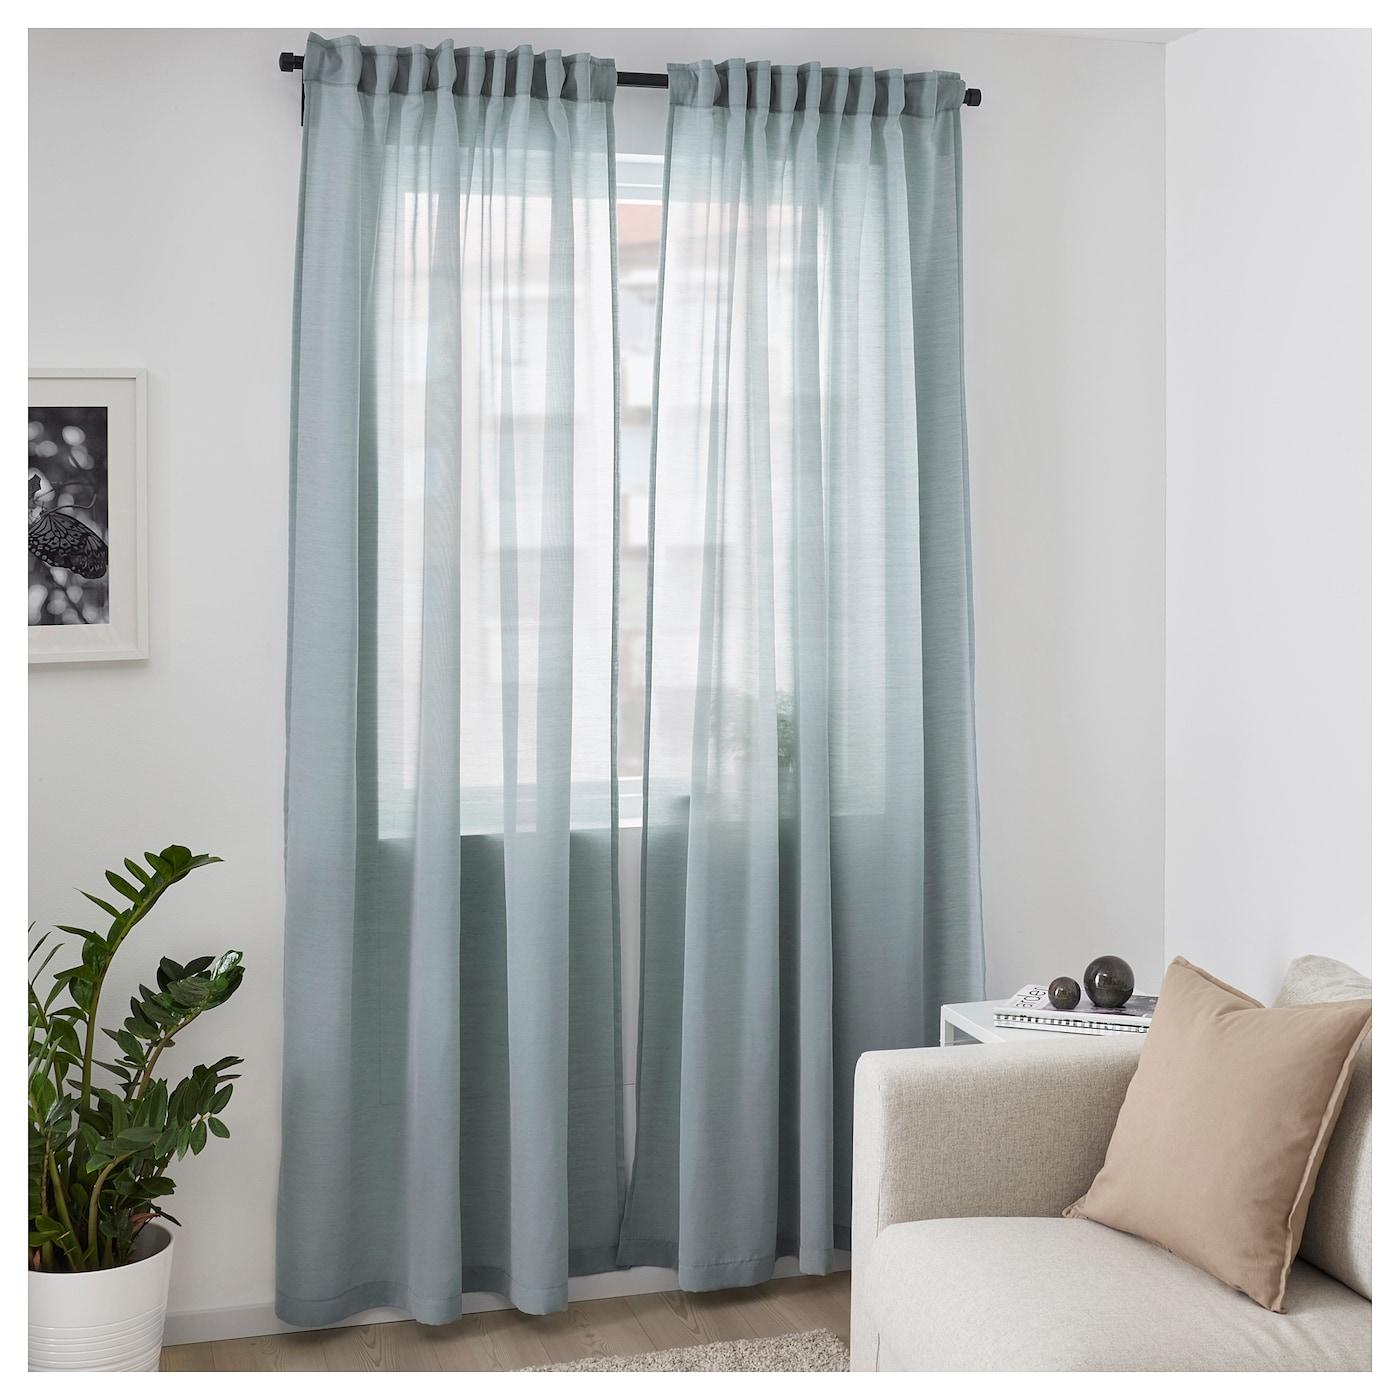 HILJA Gordijnen, 1 paar Blauw 145 x 300 cm - IKEA